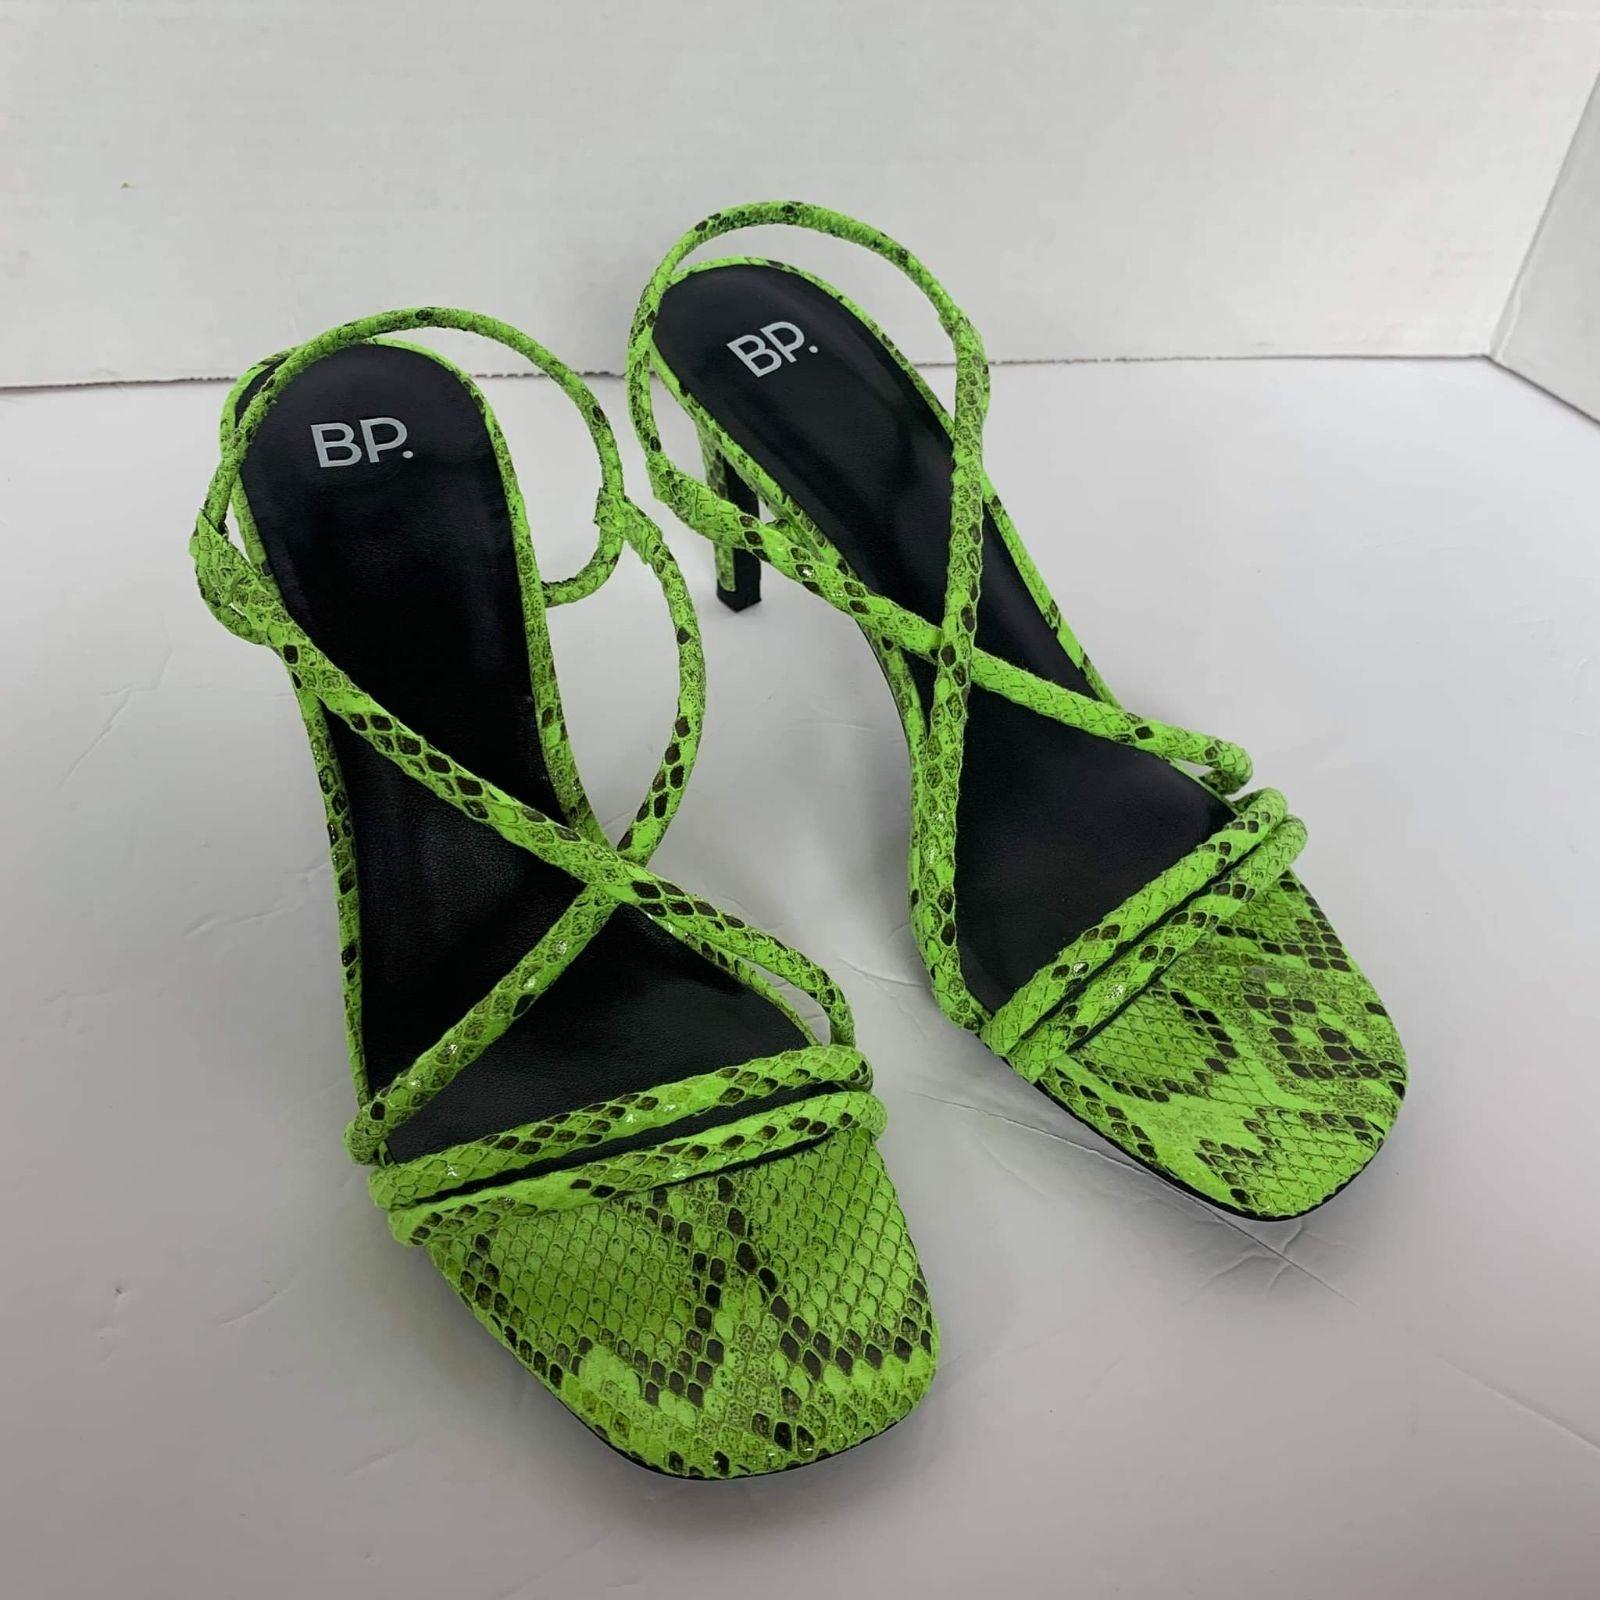 BP. Neon Green Strappy Square toe Heels